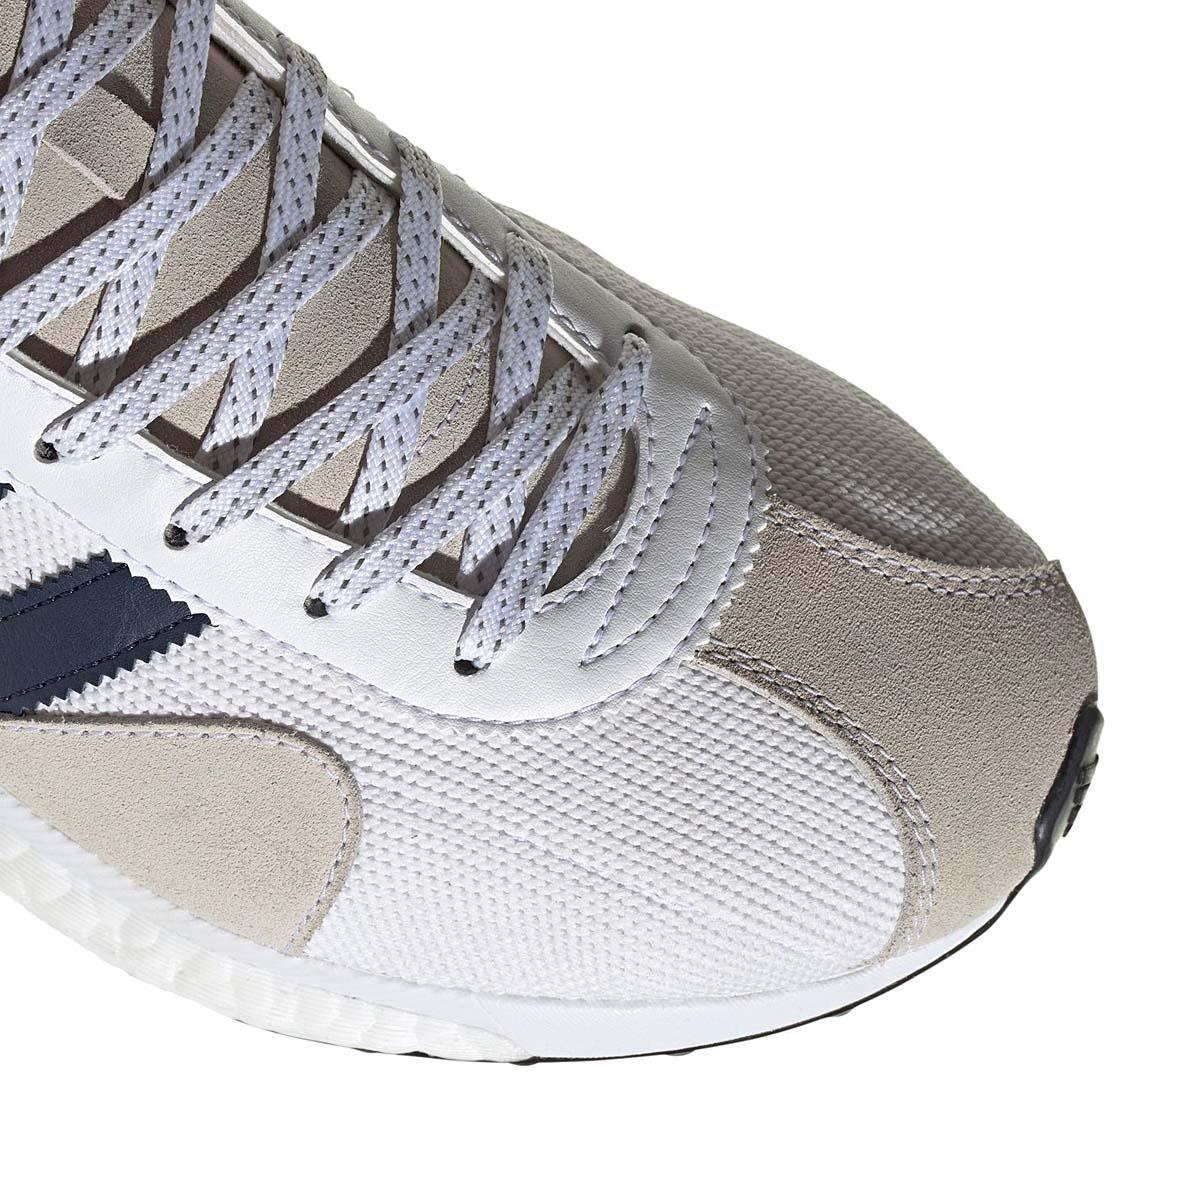 HUMAN MADE x adidas TOKIO SOLAR HM FOOTWEARWHITE / COLLAGENAVY / COREBLACK FZ0551 ヒューマンメイド × アディダス トキオ ソーラー HM ホワイト/ネイビー